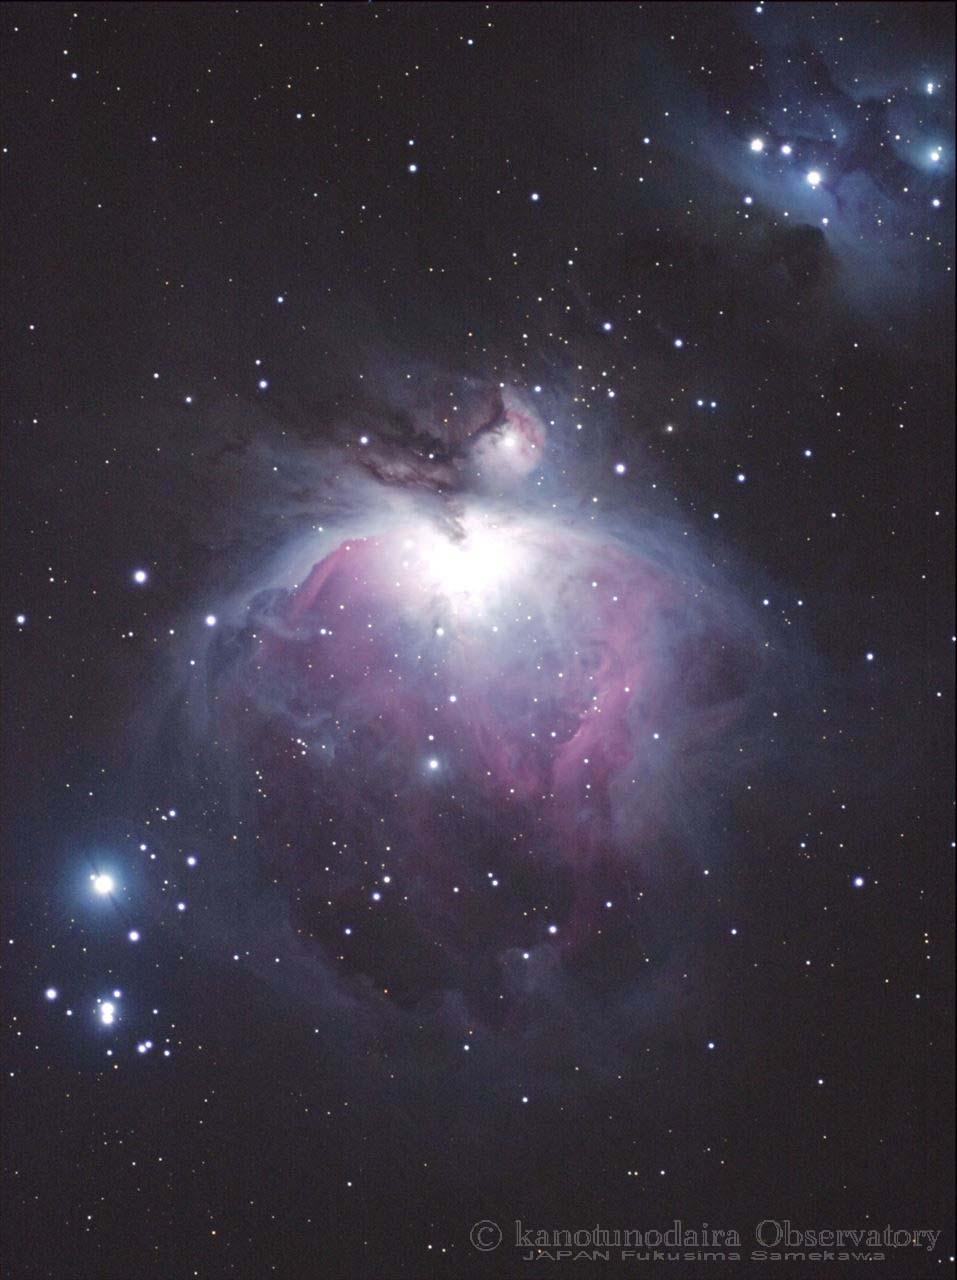 オリンパスでオリオン大星雲